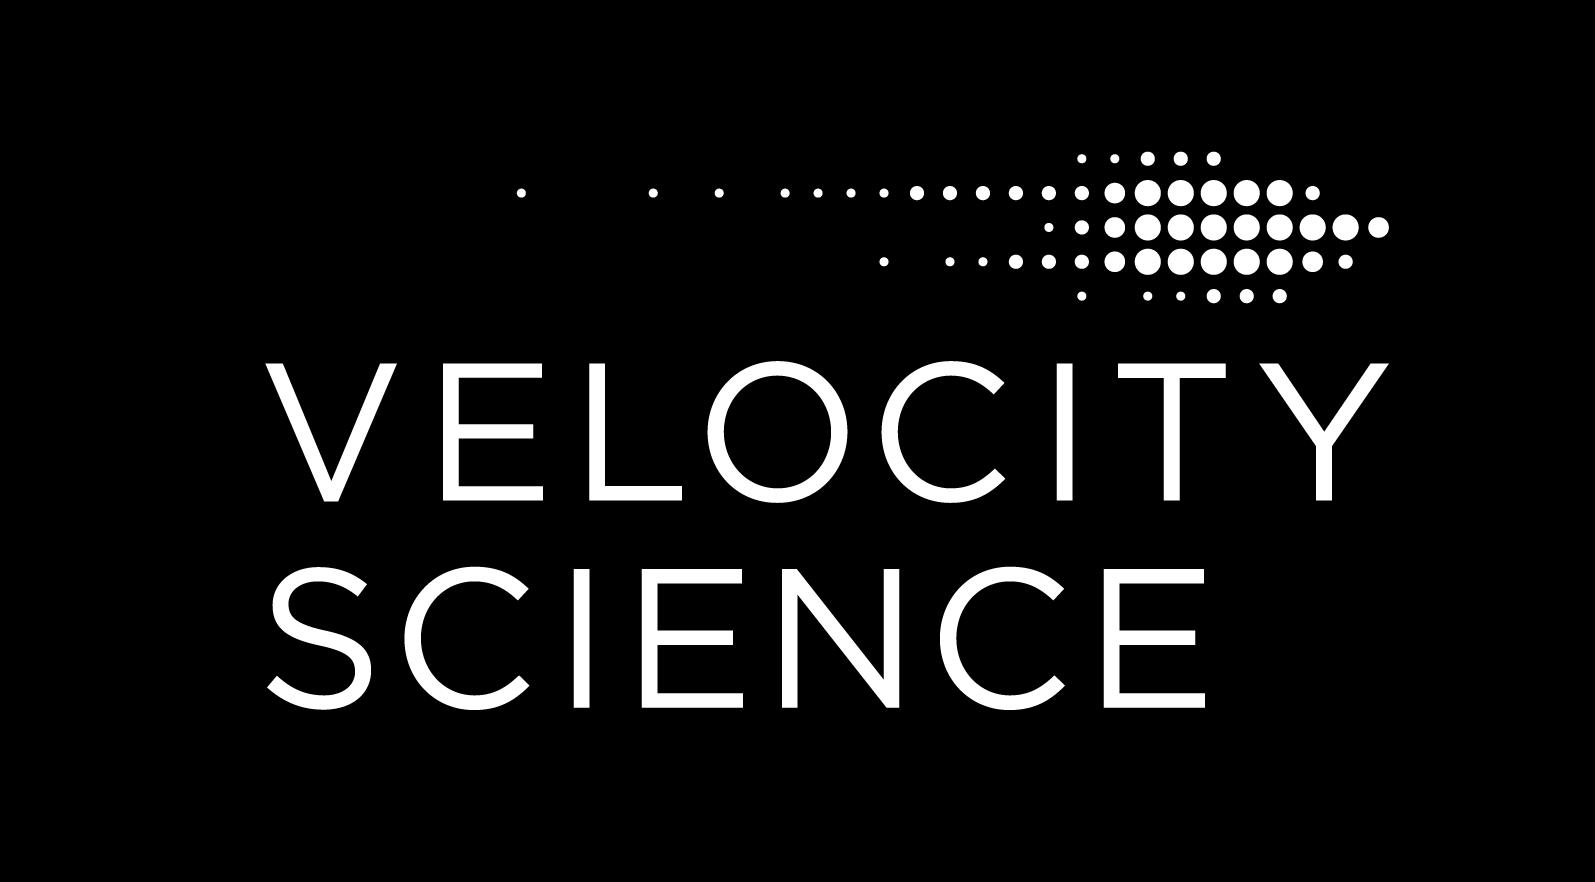 Velocity Science logo